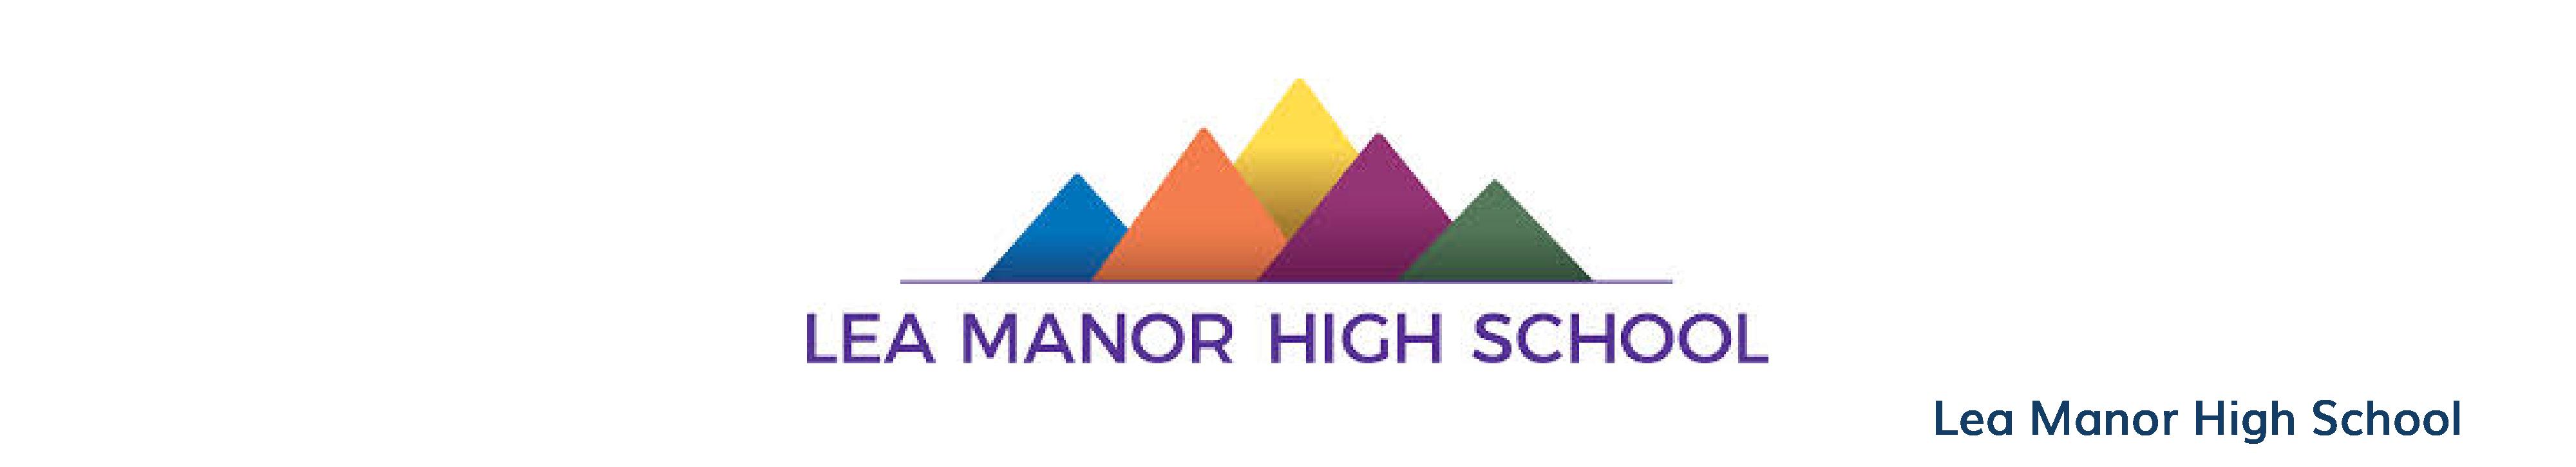 Lea Manor High School